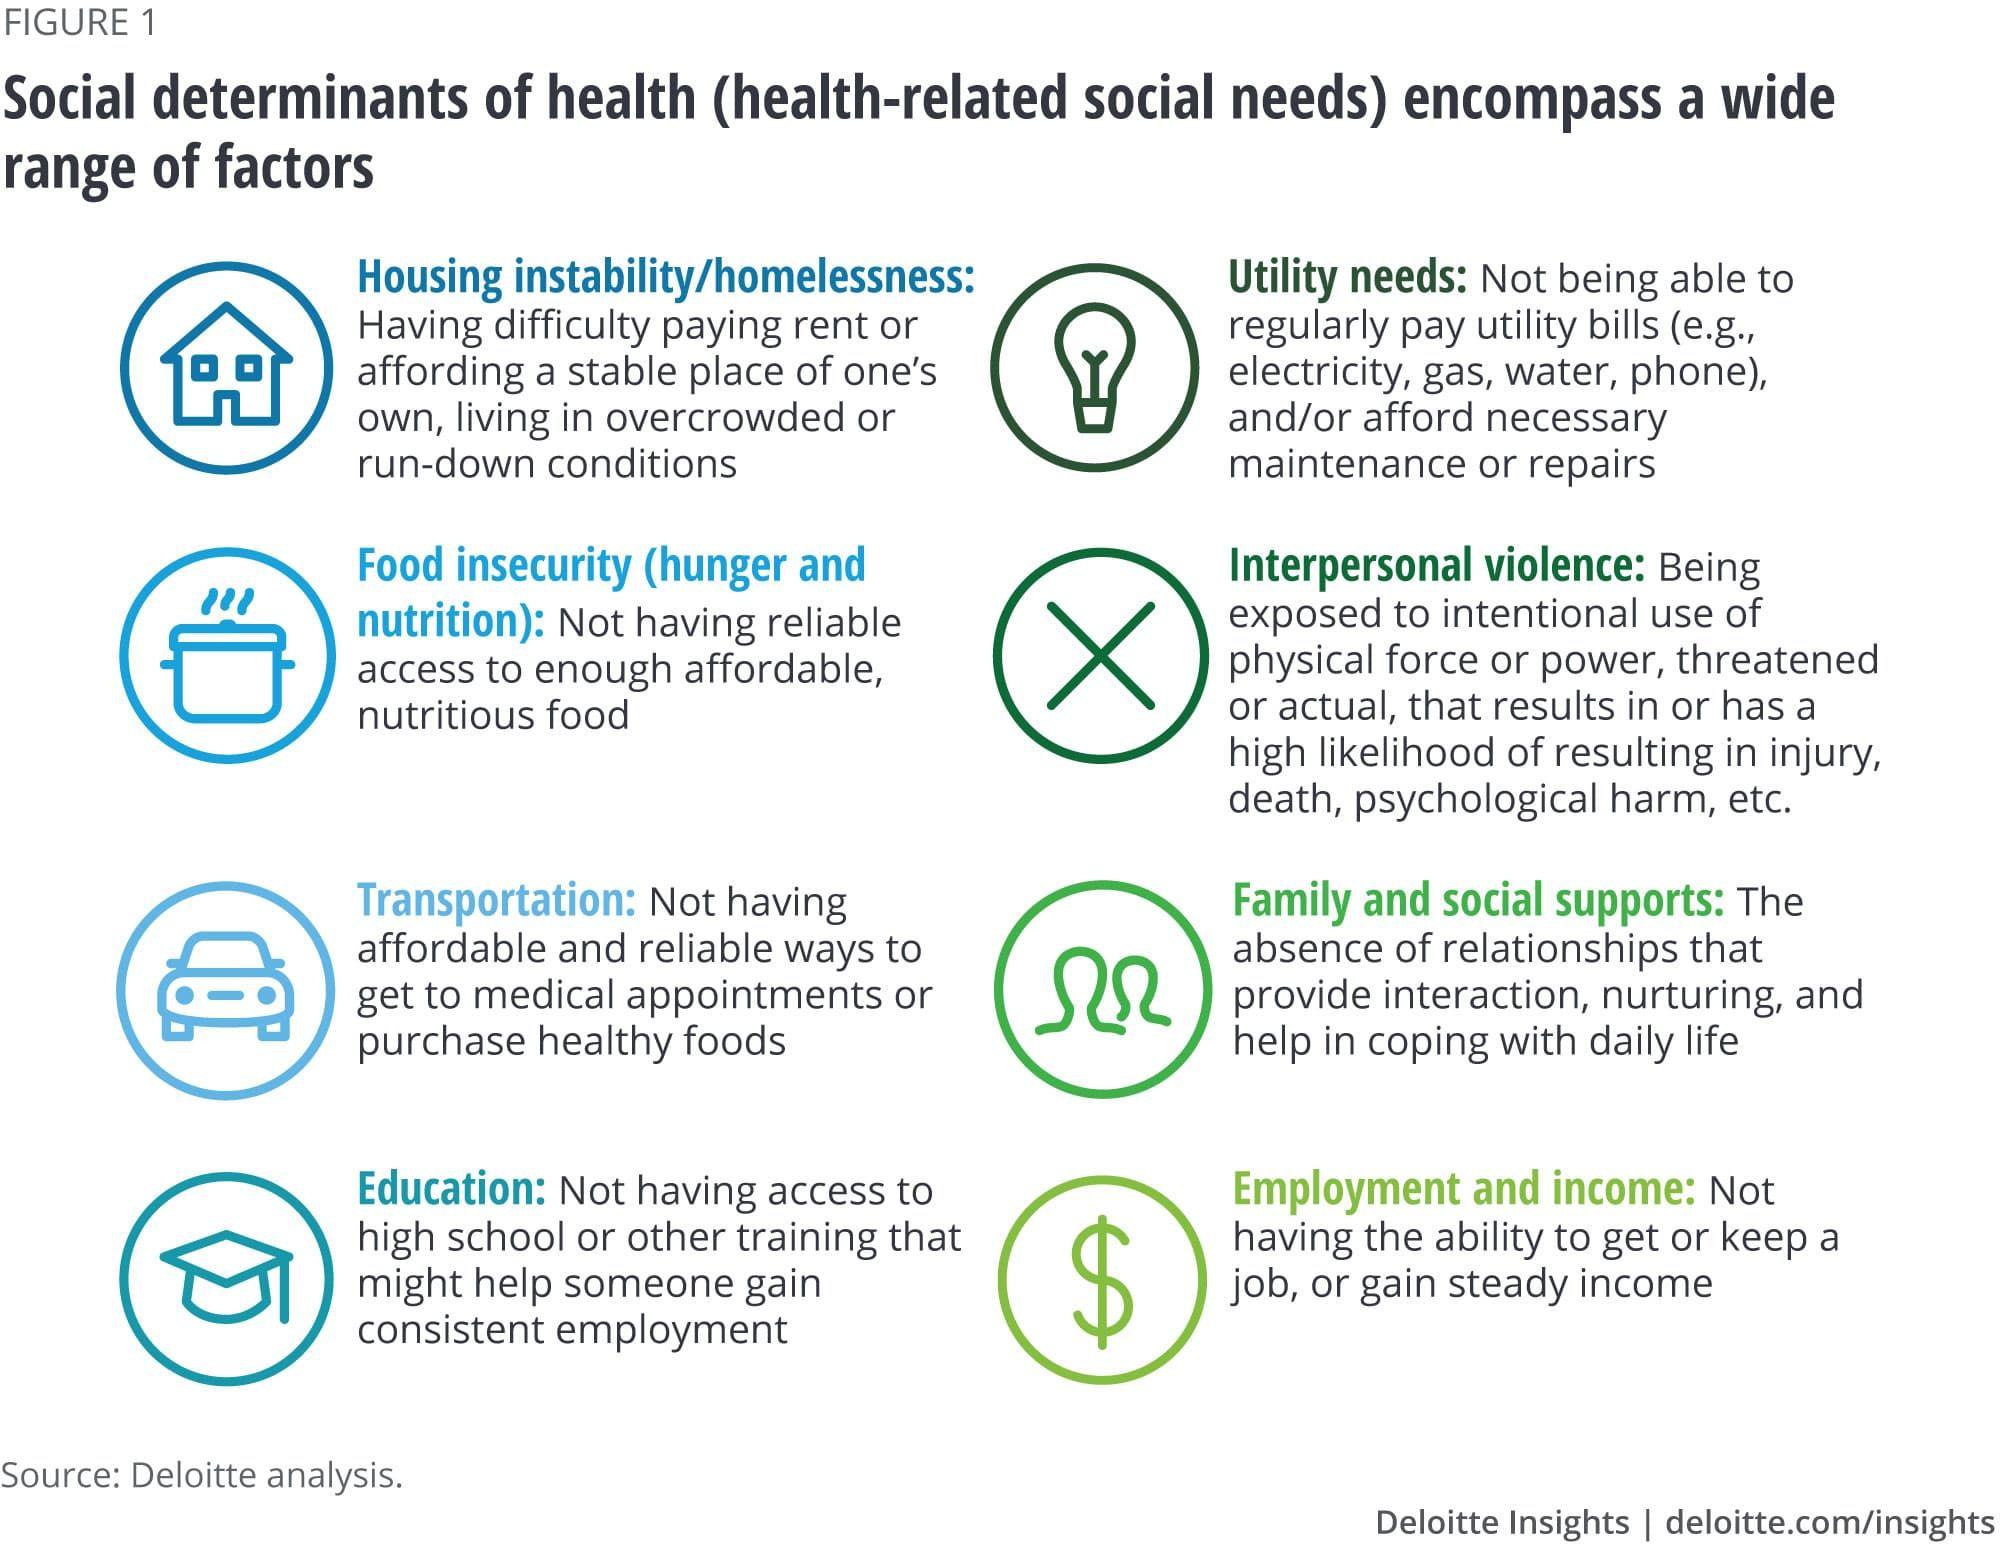 Social Determinants Of Health Health Related Social Needs